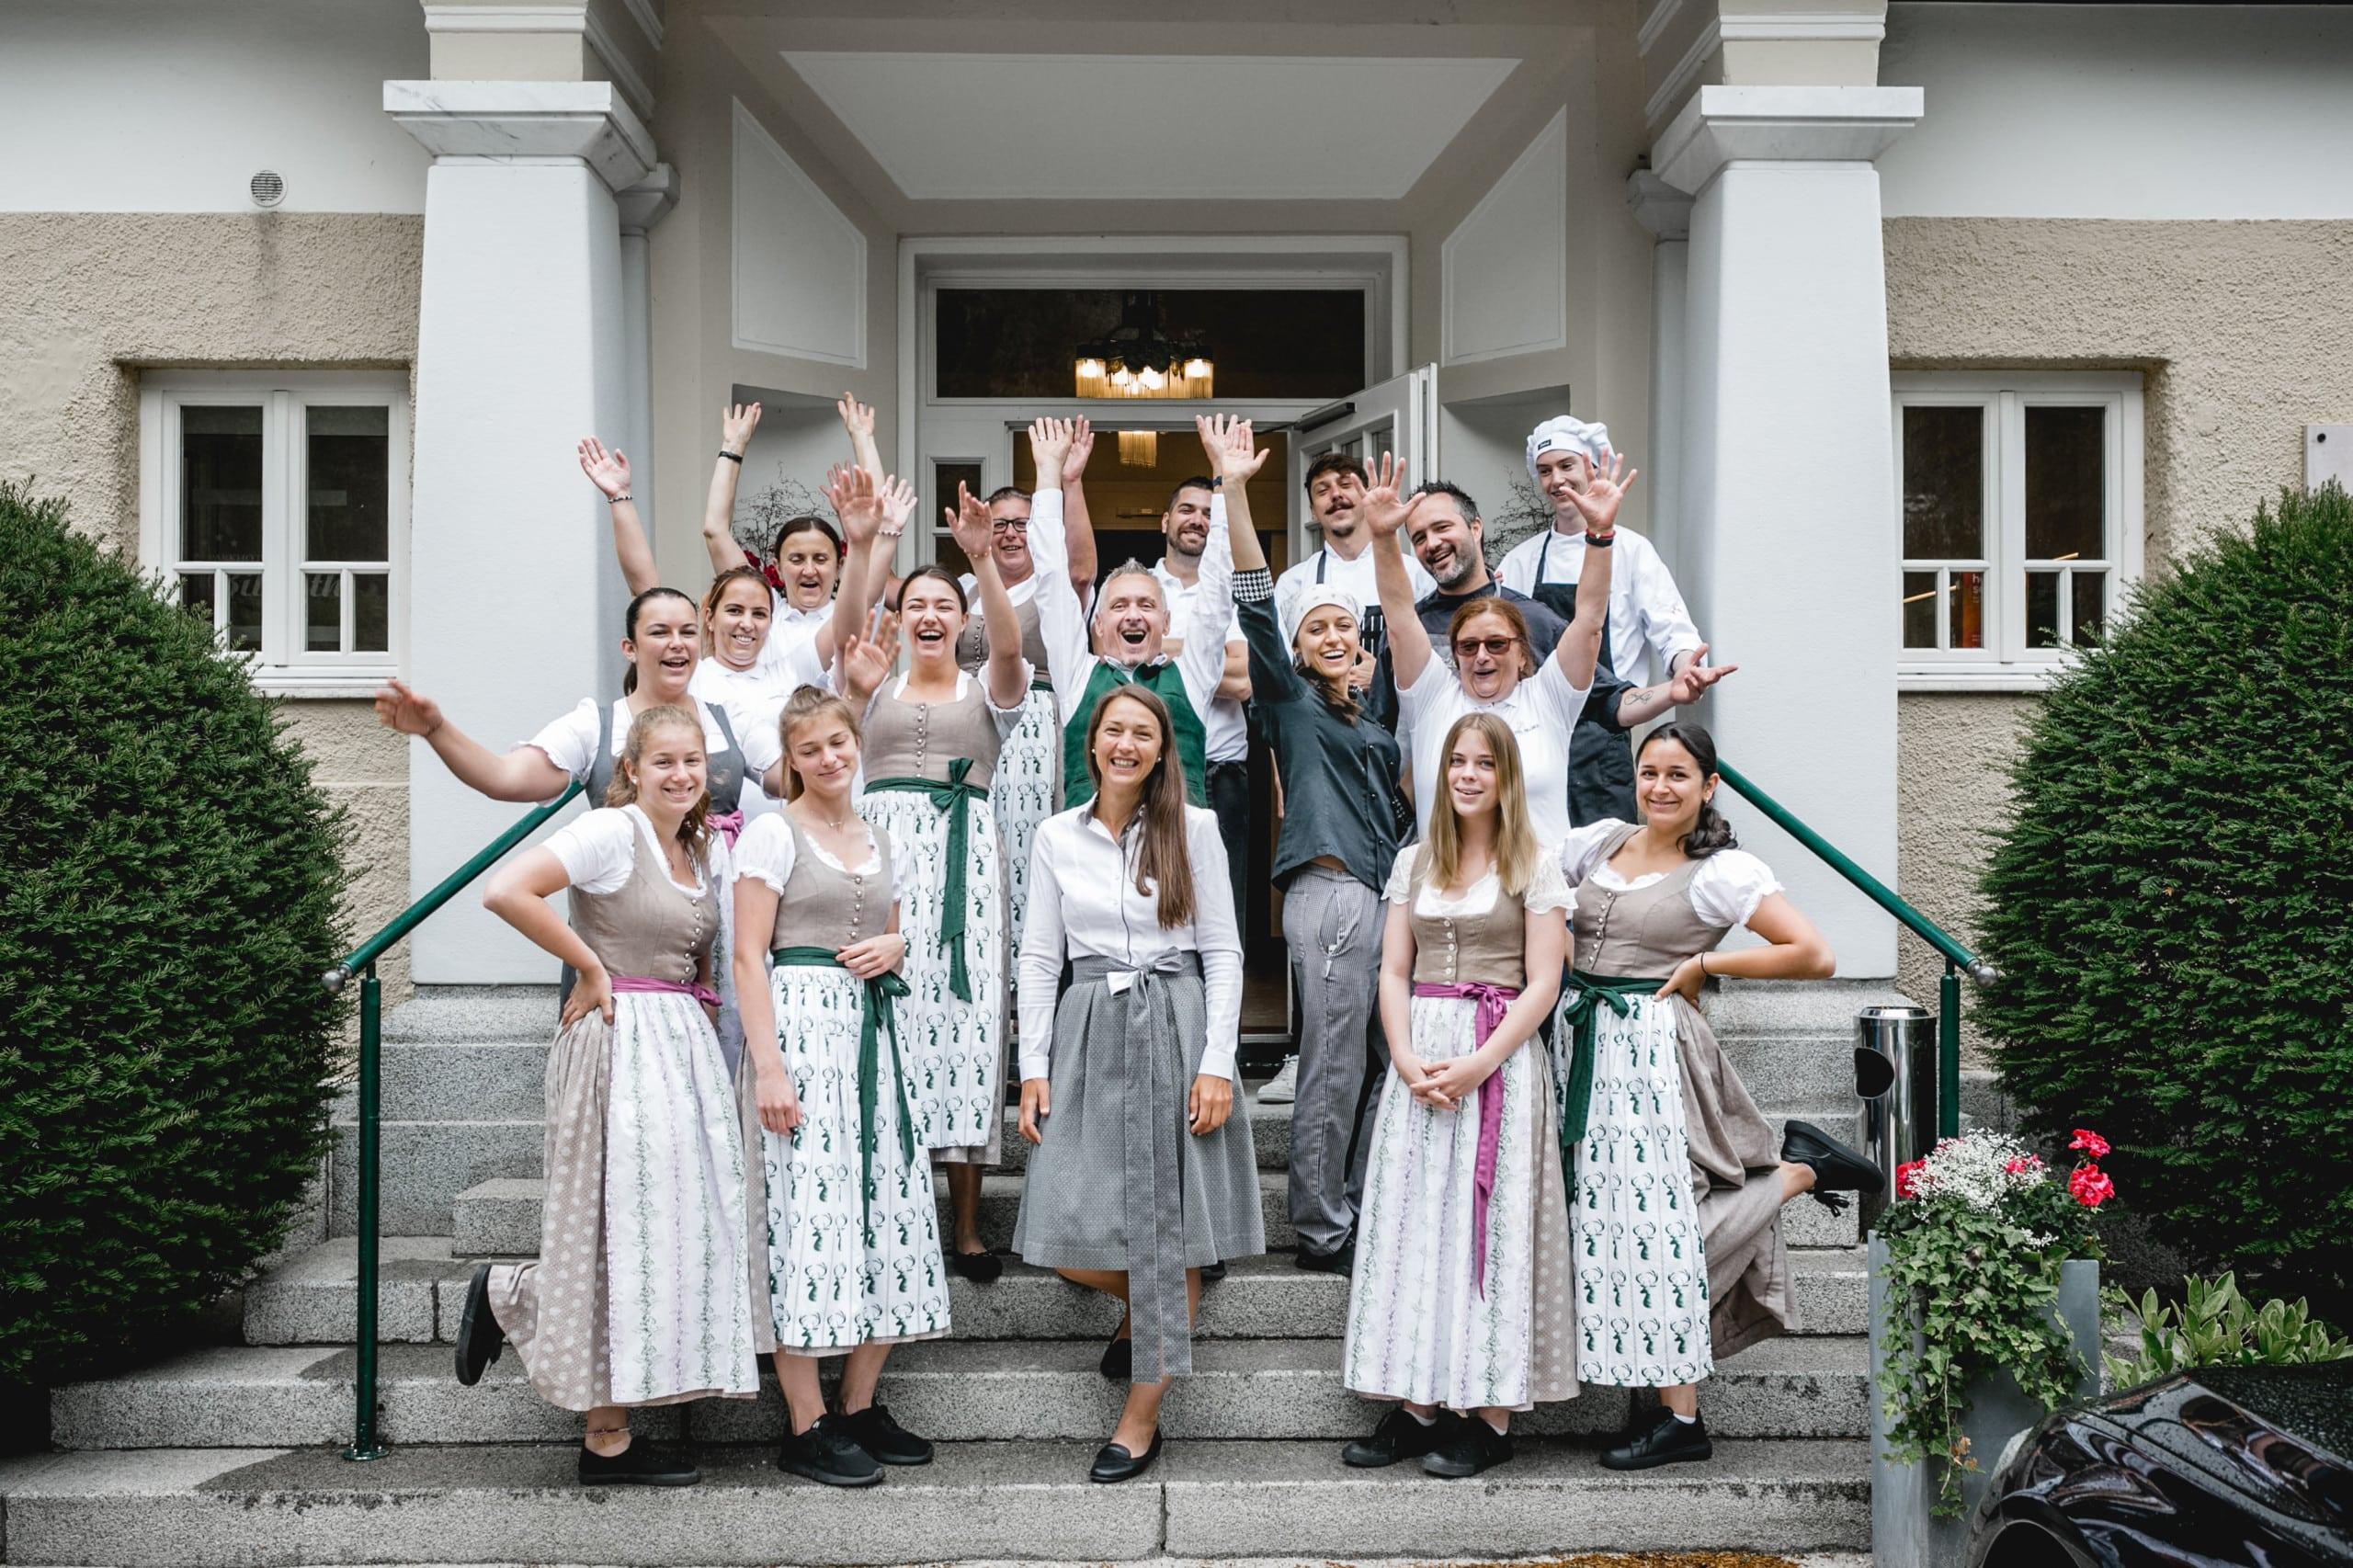 Das Seehotel Billroth Seehotel-Billroth-Team-scaled